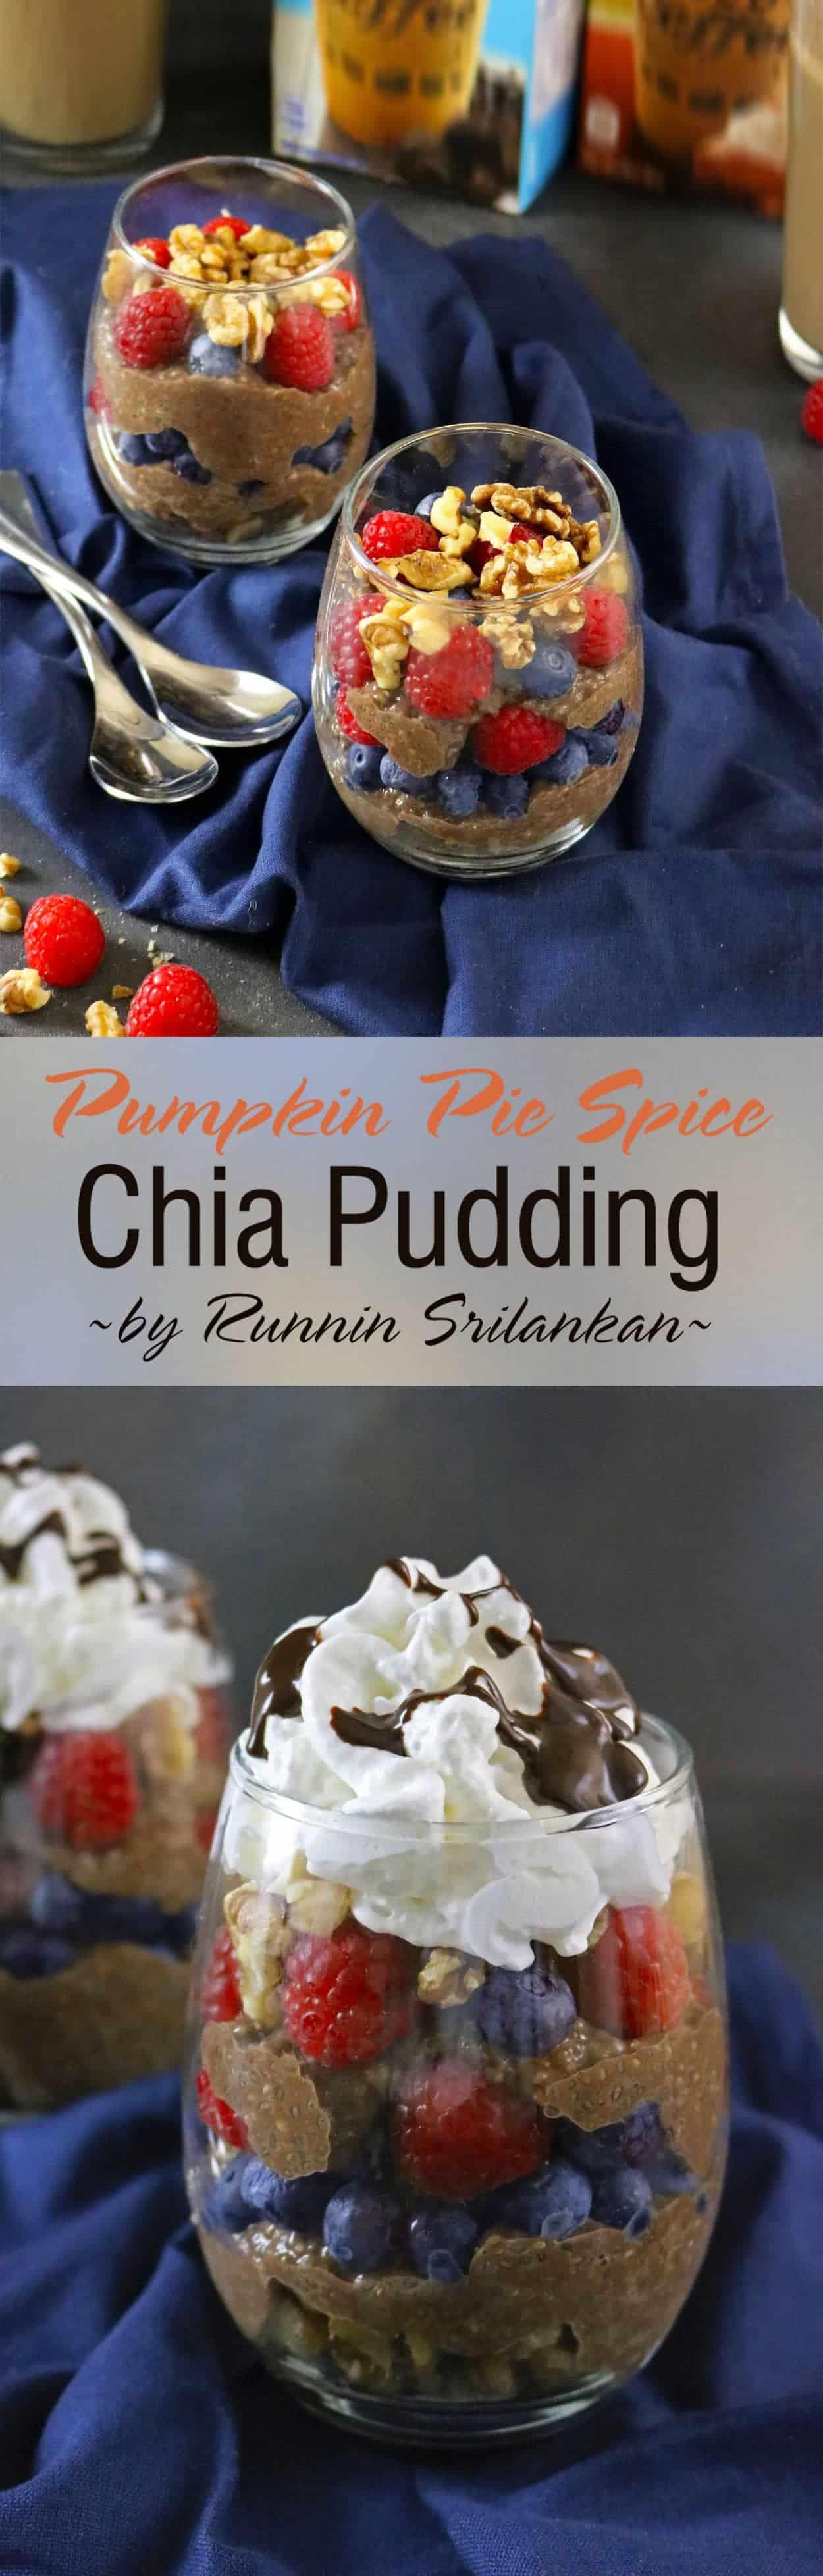 Pumpkin Pie Spice Chia Pudding #foundmydelight